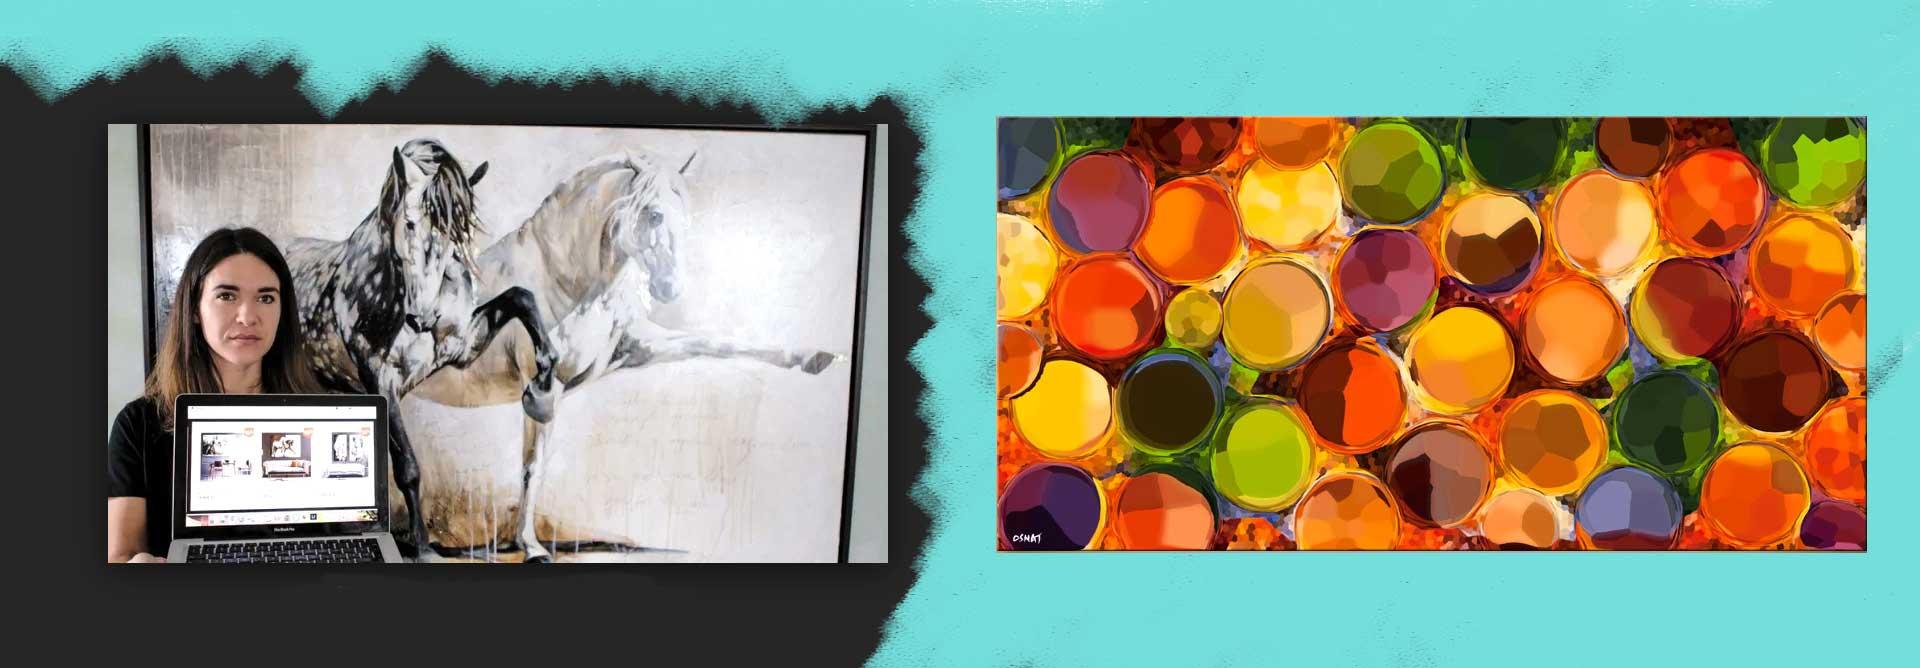 professiona1 photographe 8a - ۹۹ روش برای فروش آثار هنری